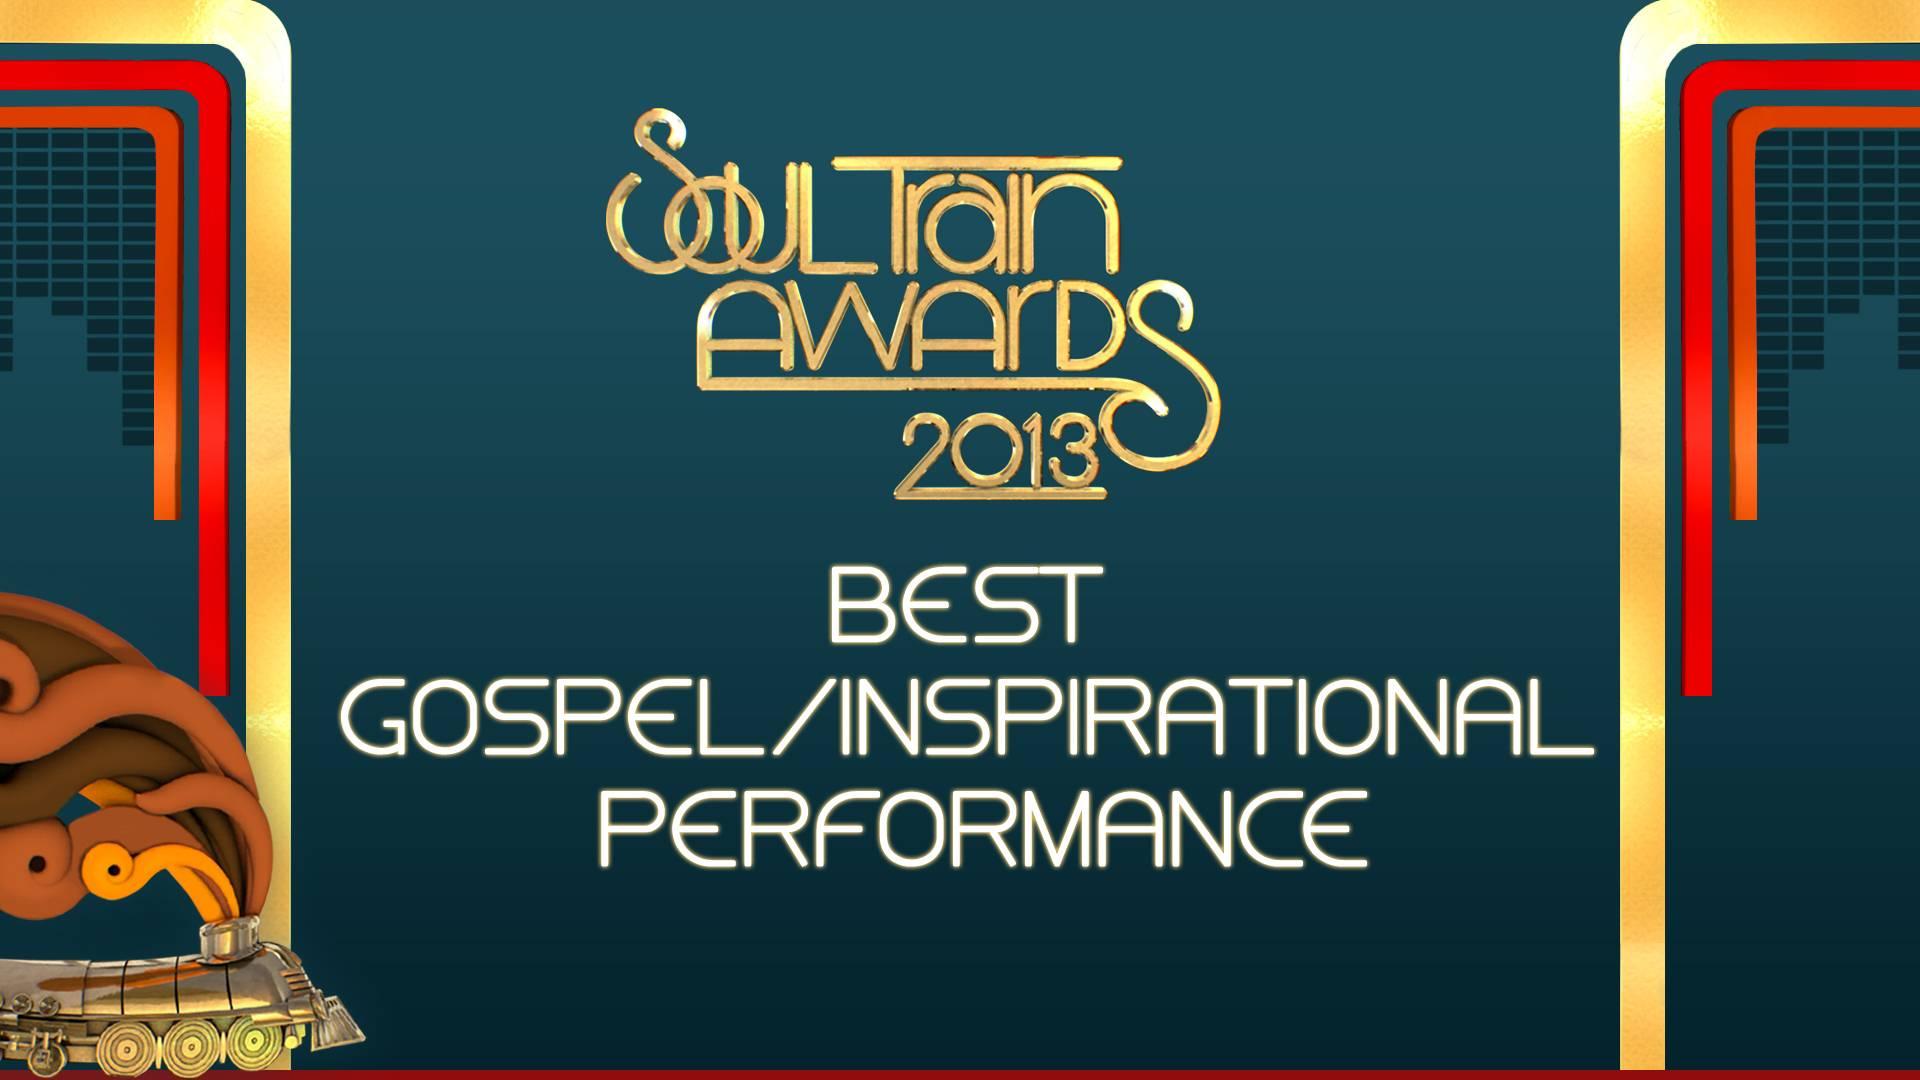 Best Gospel/Inspirational Performance